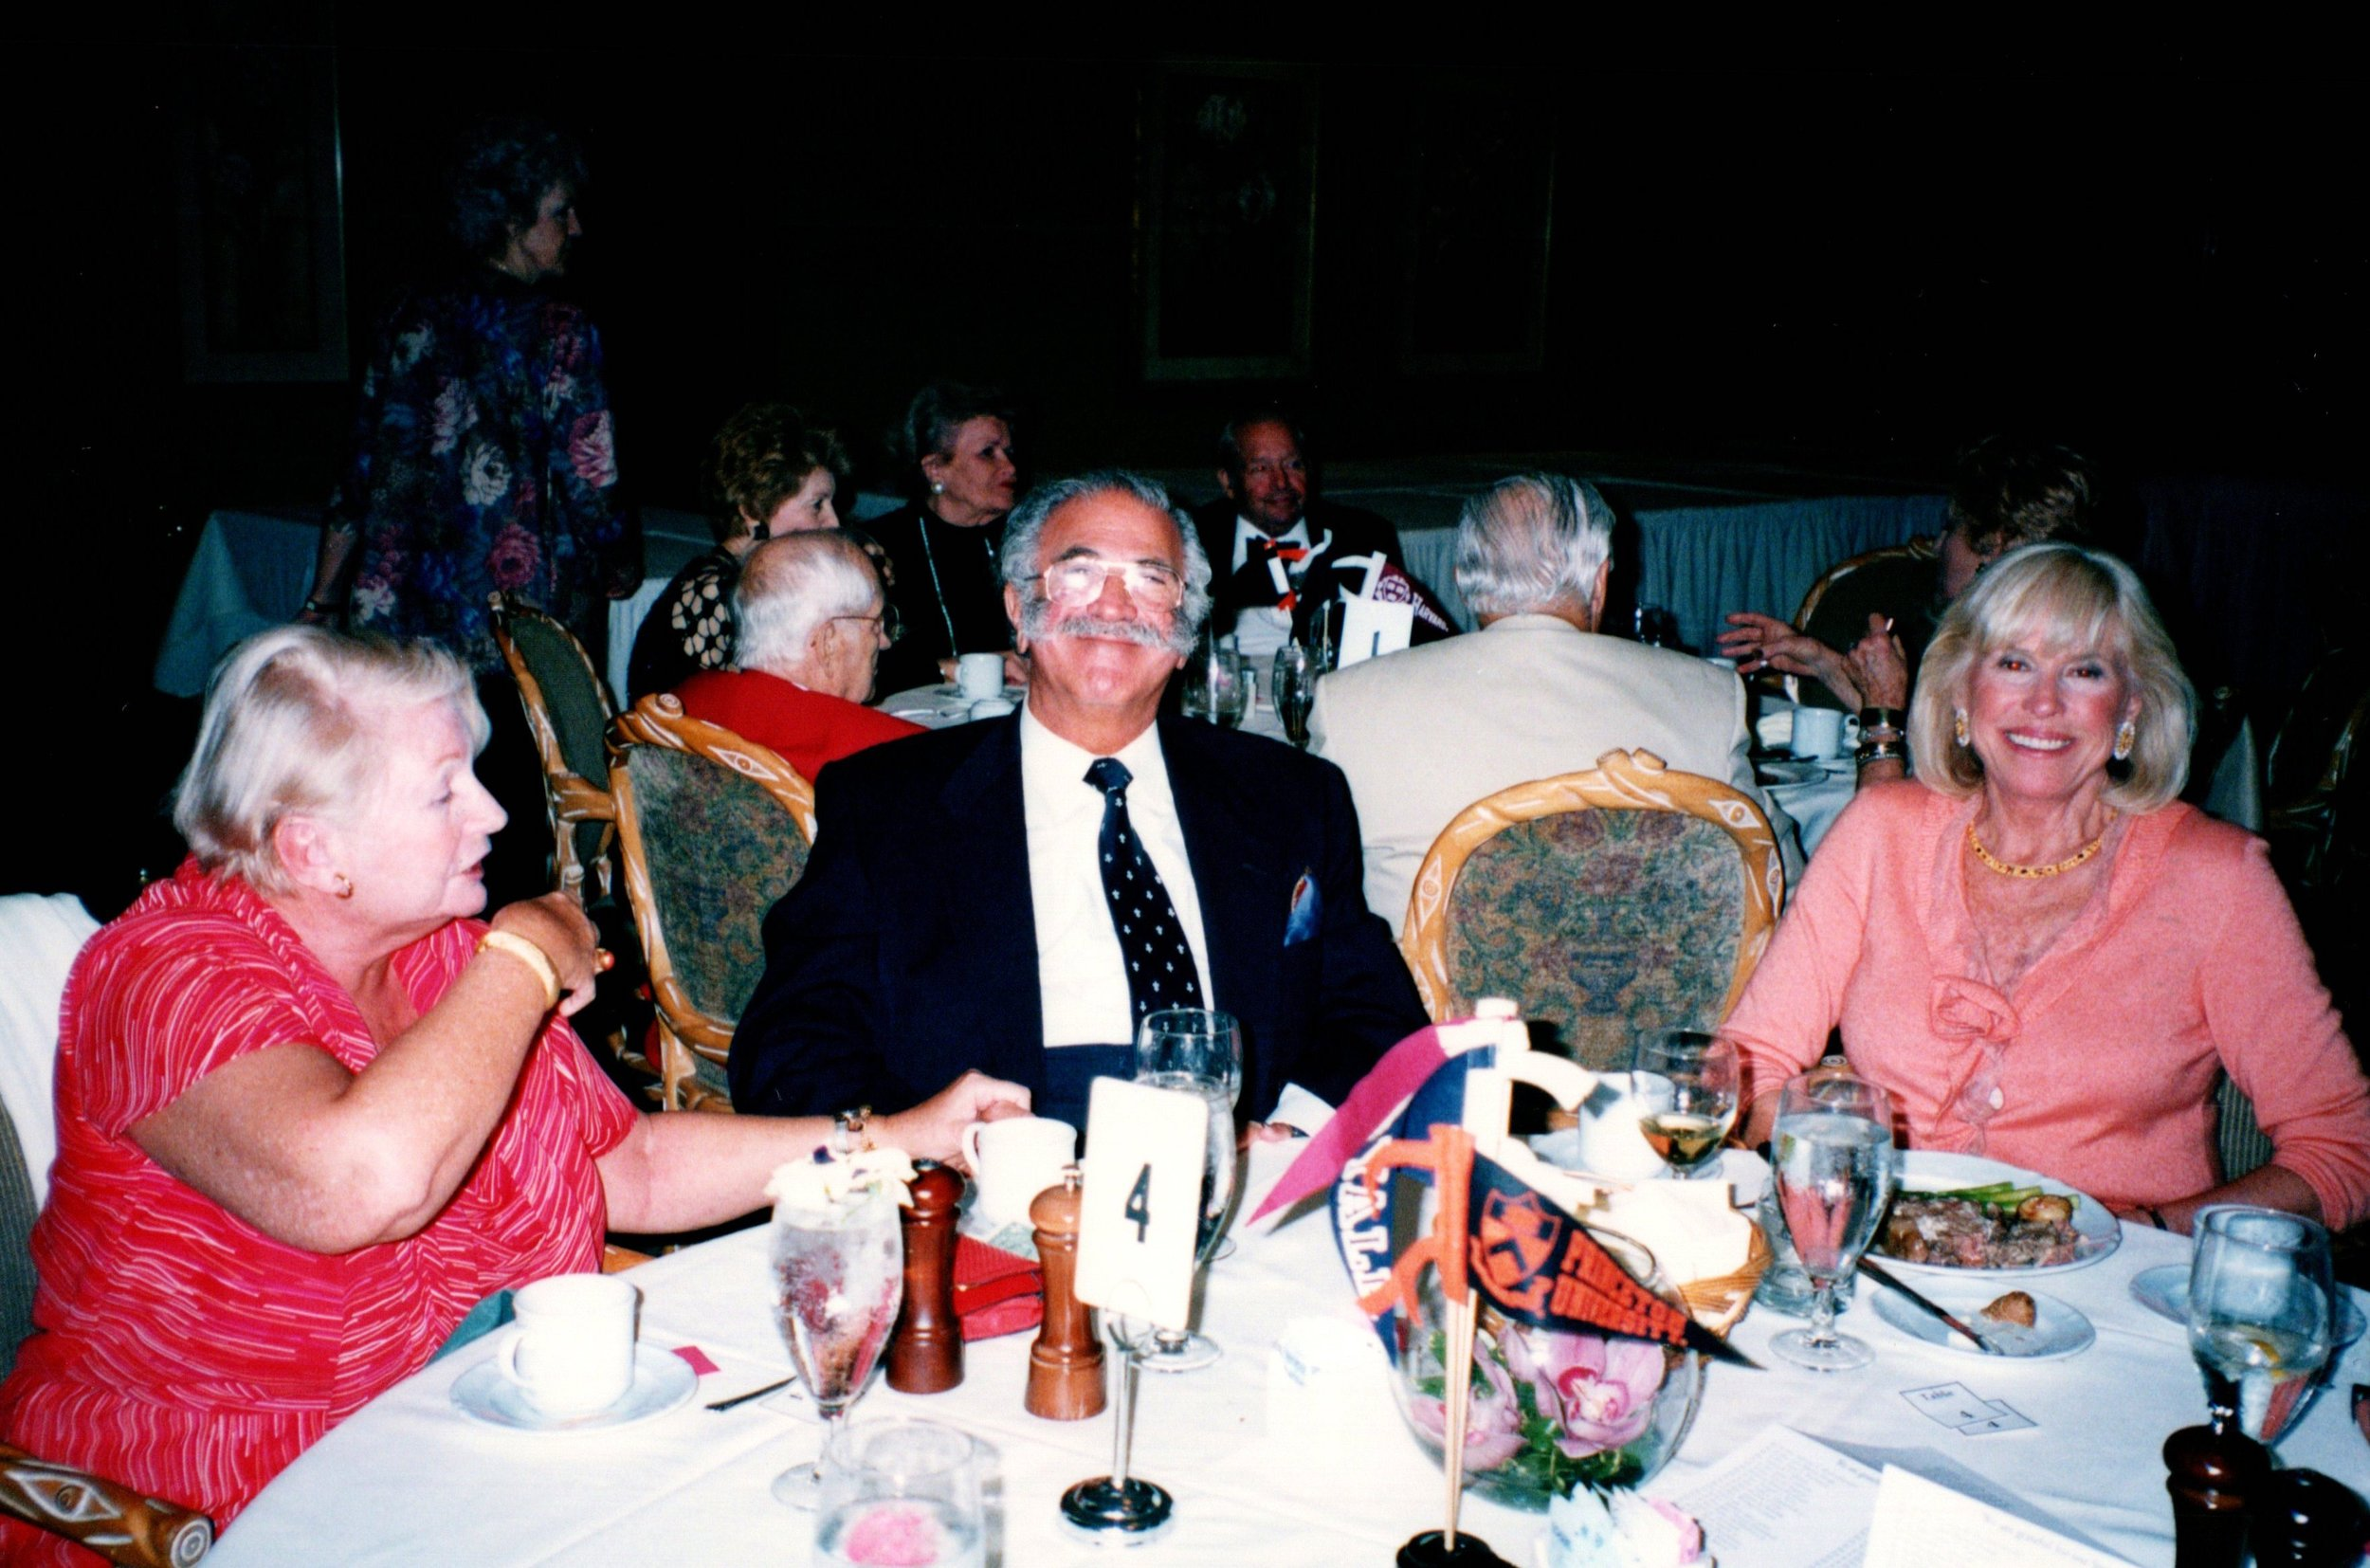 2_11_2002 - HYP DINNER DANCE - VINEYARD COUNTRY CLUB 8.jpg